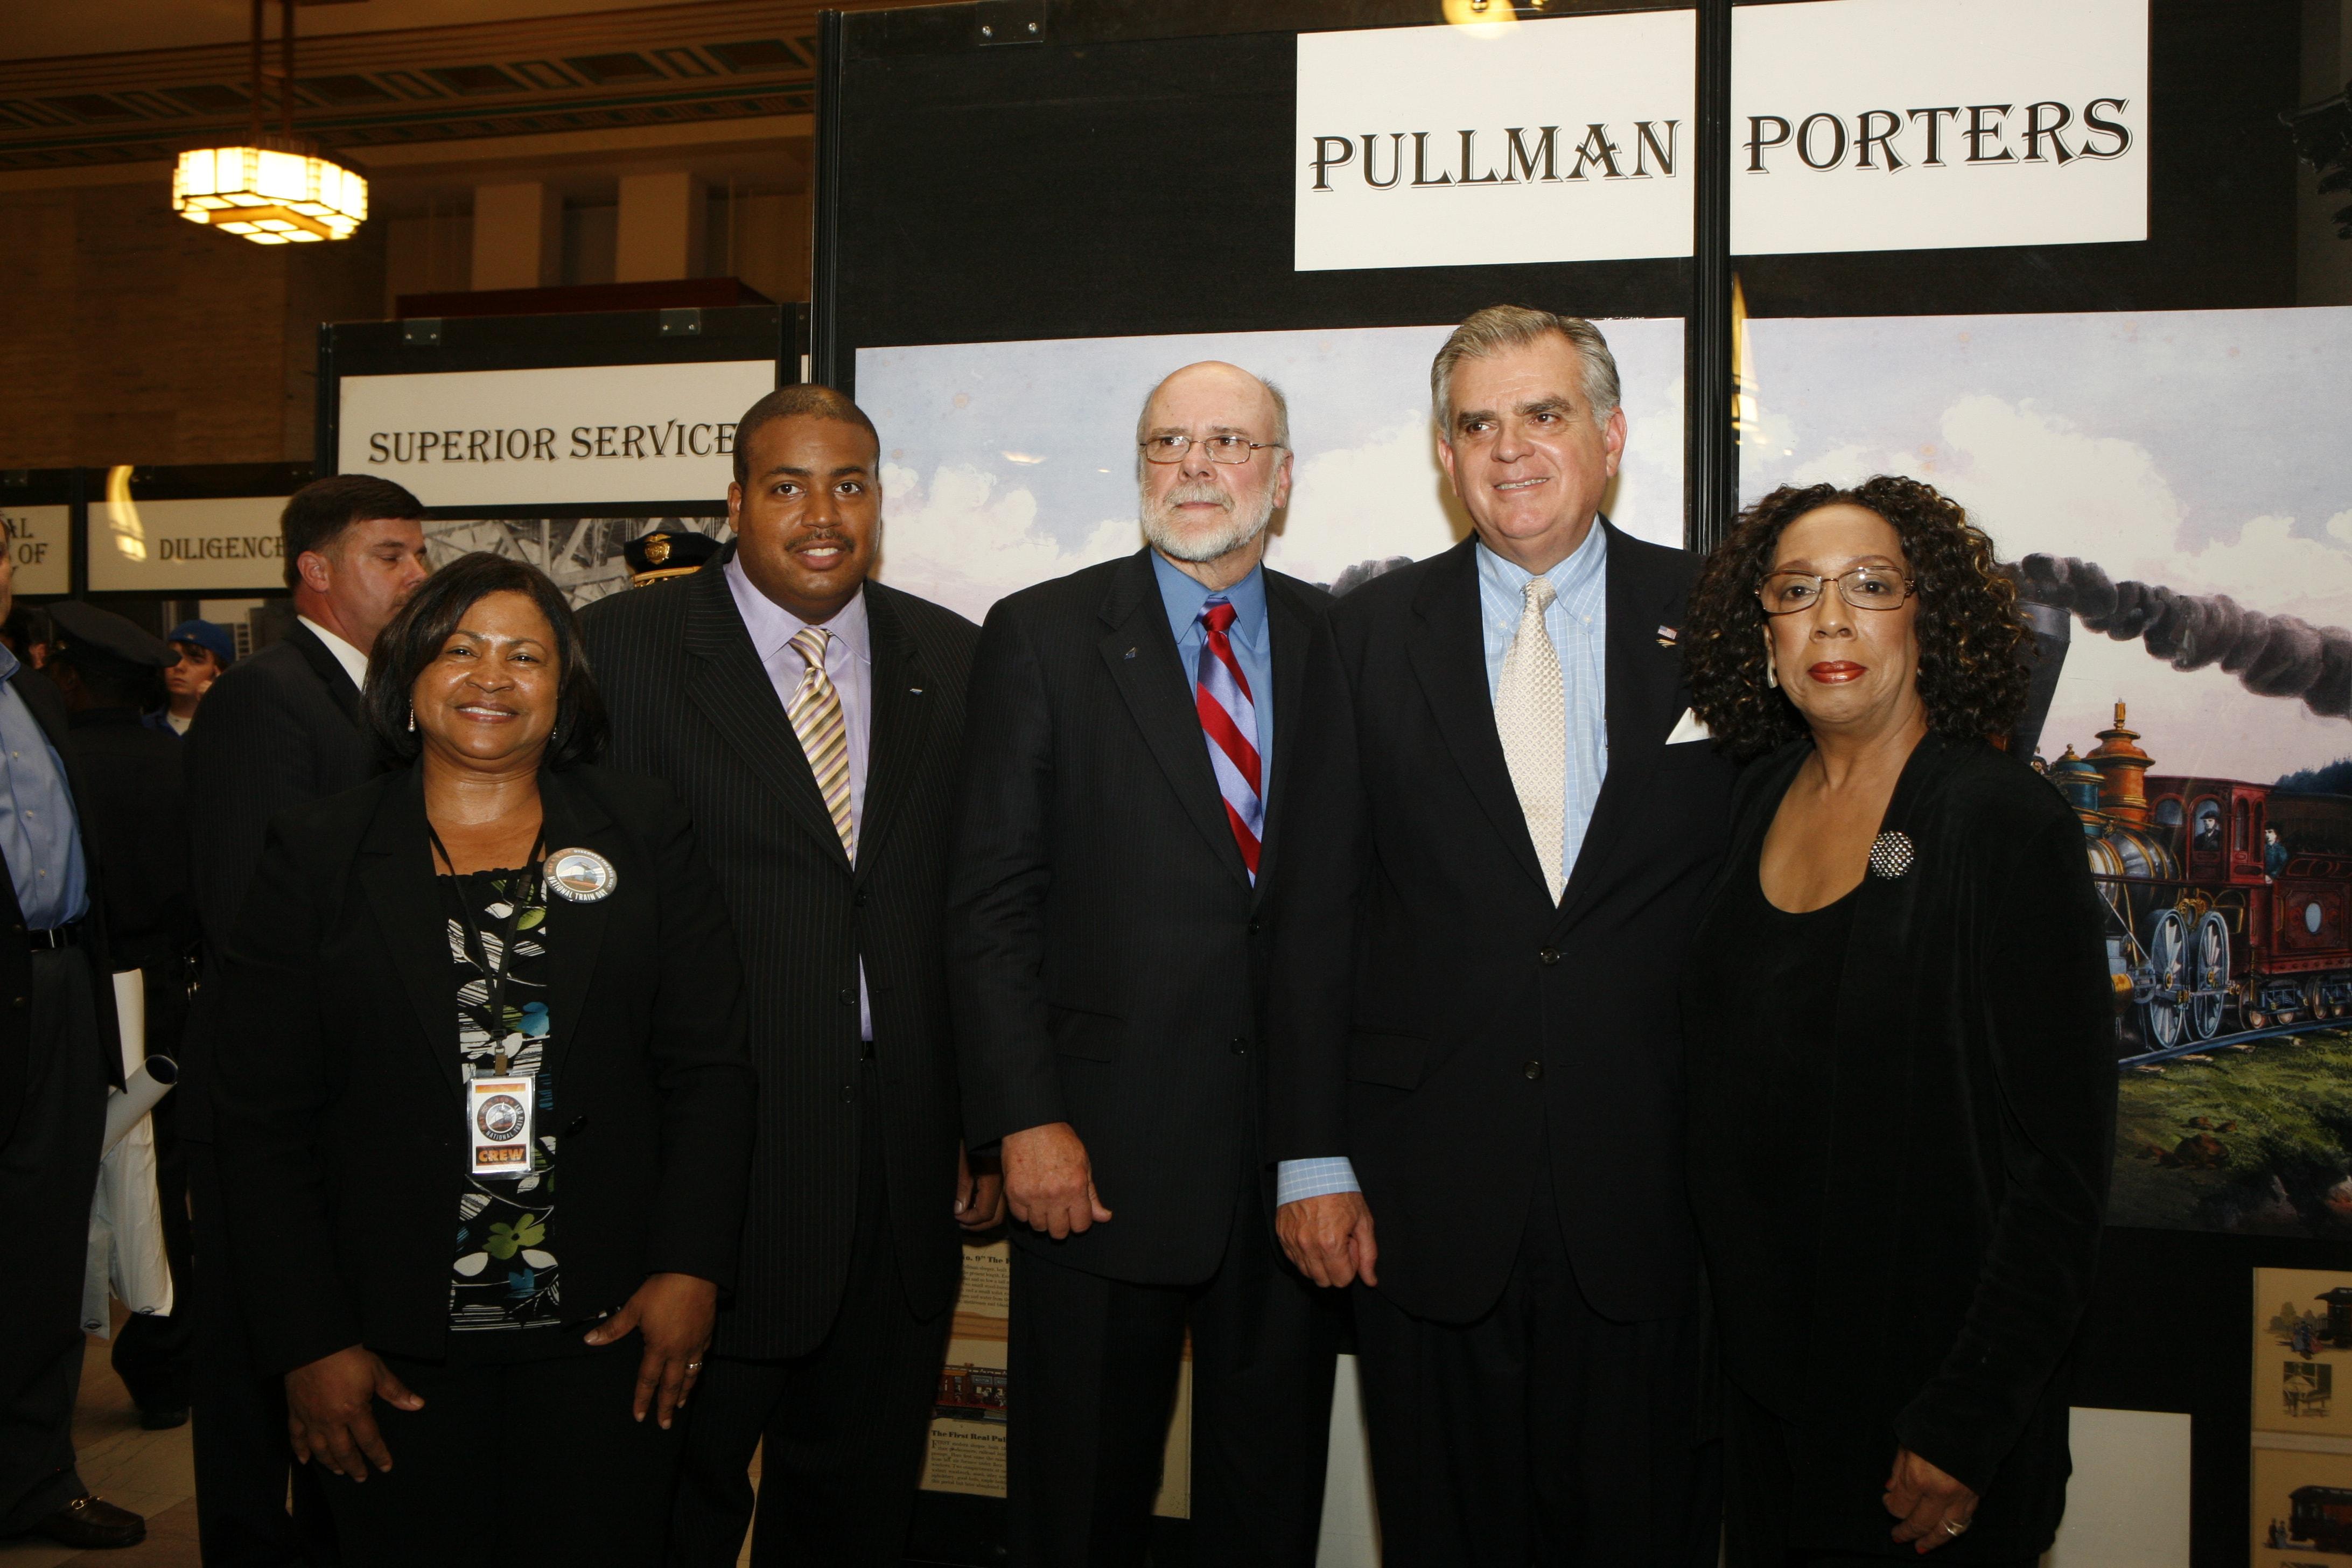 Pullman porters in Philadelphia Sat., May 9, 2009. (AP Photo/Mark Stehle)